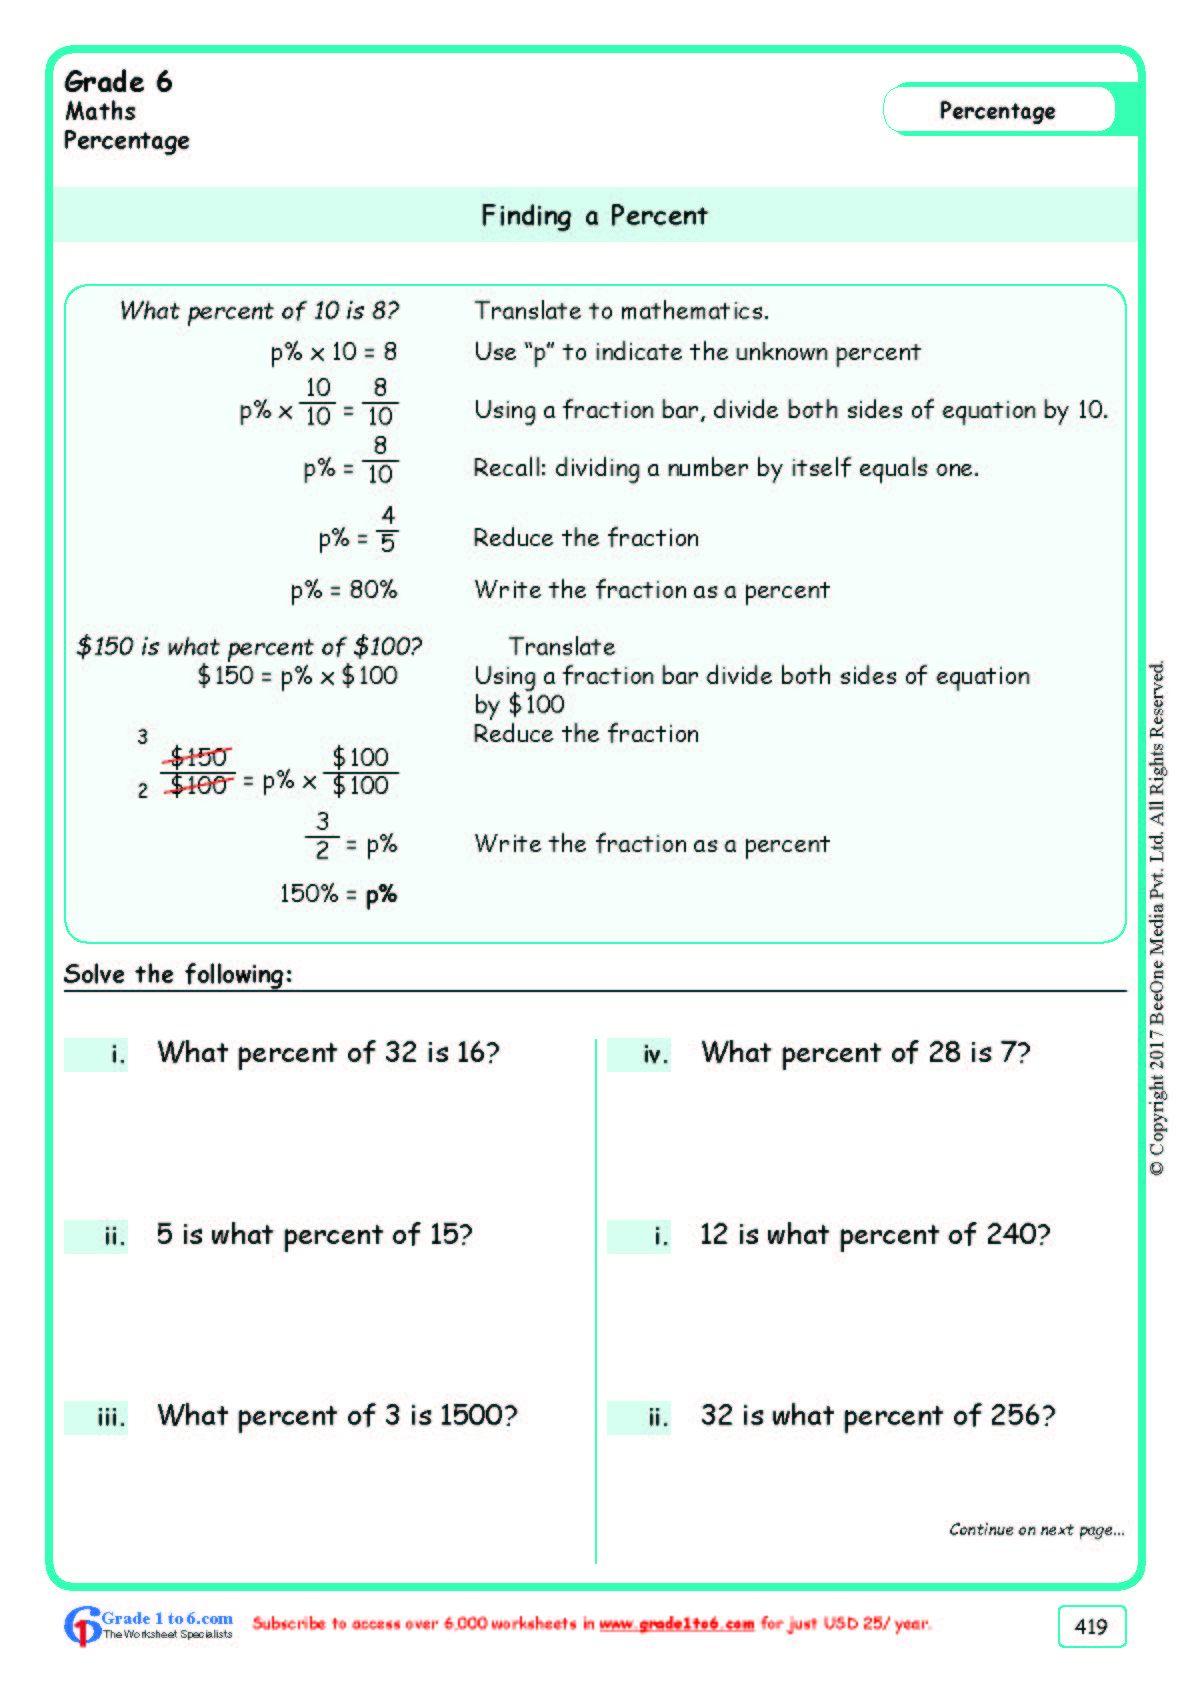 Worksheet Grad E 6 Math Finding A Percent In